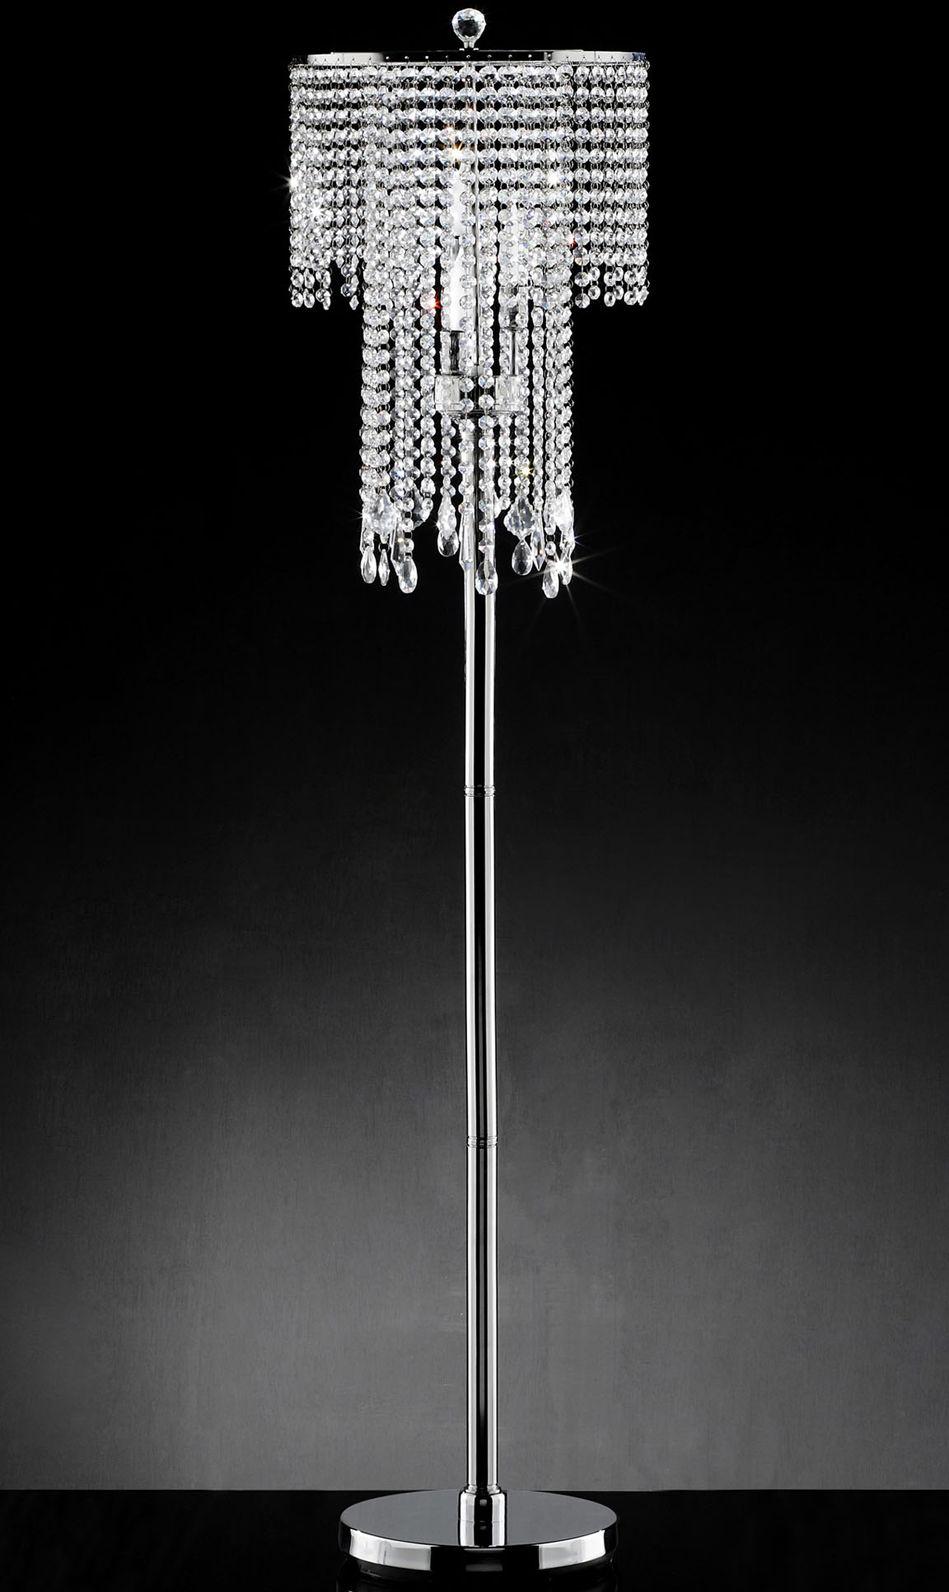 Fantasy Real Crystal Floor Lamp Crystal Floor Lamp Crystal Floor Chandelier Floor Lamp